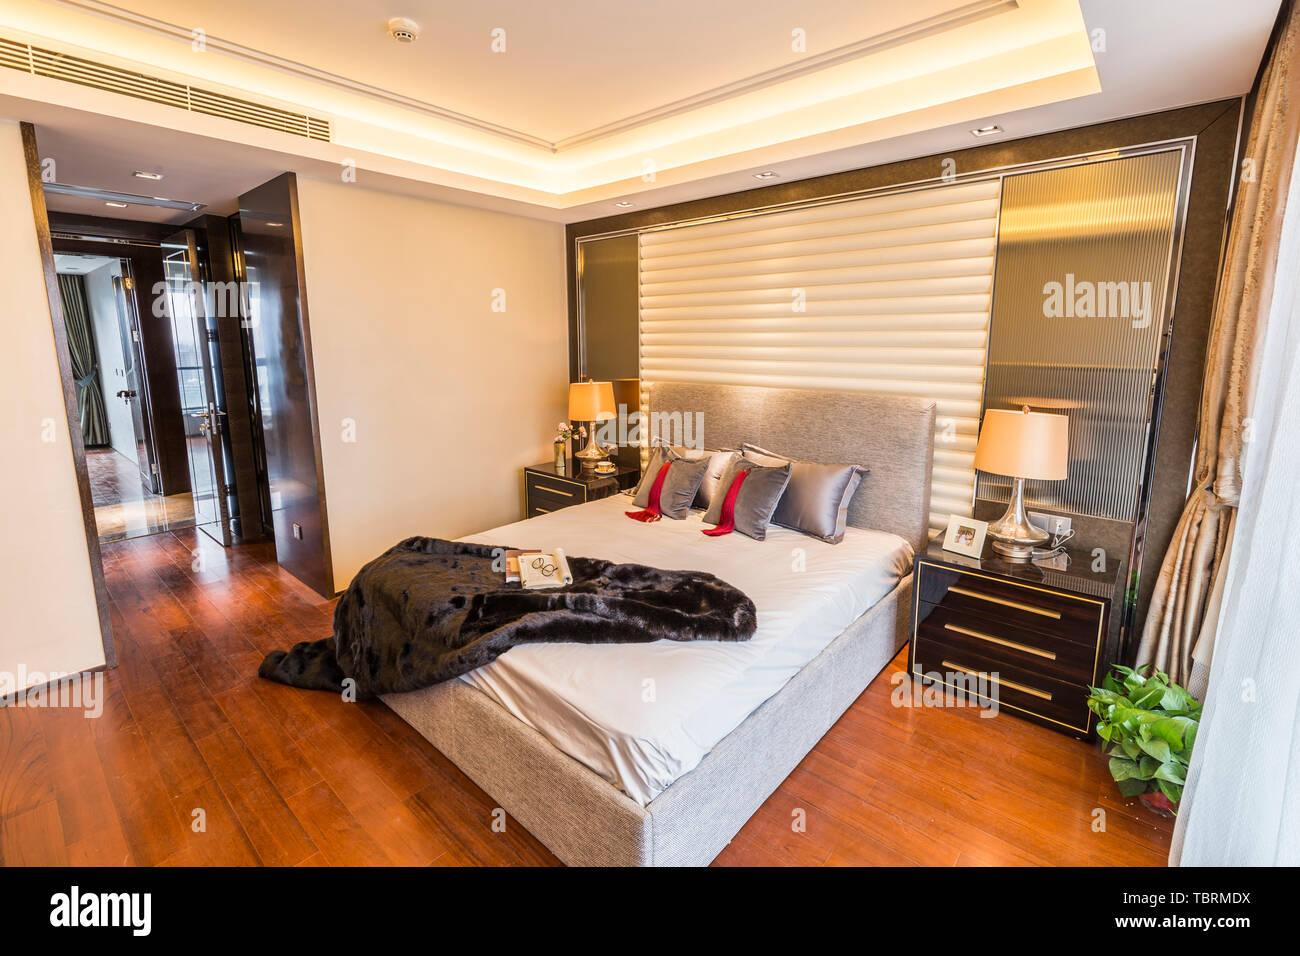 Model Room Interior Interior Design Living Room High Definition Diagram Stock Photo Alamy